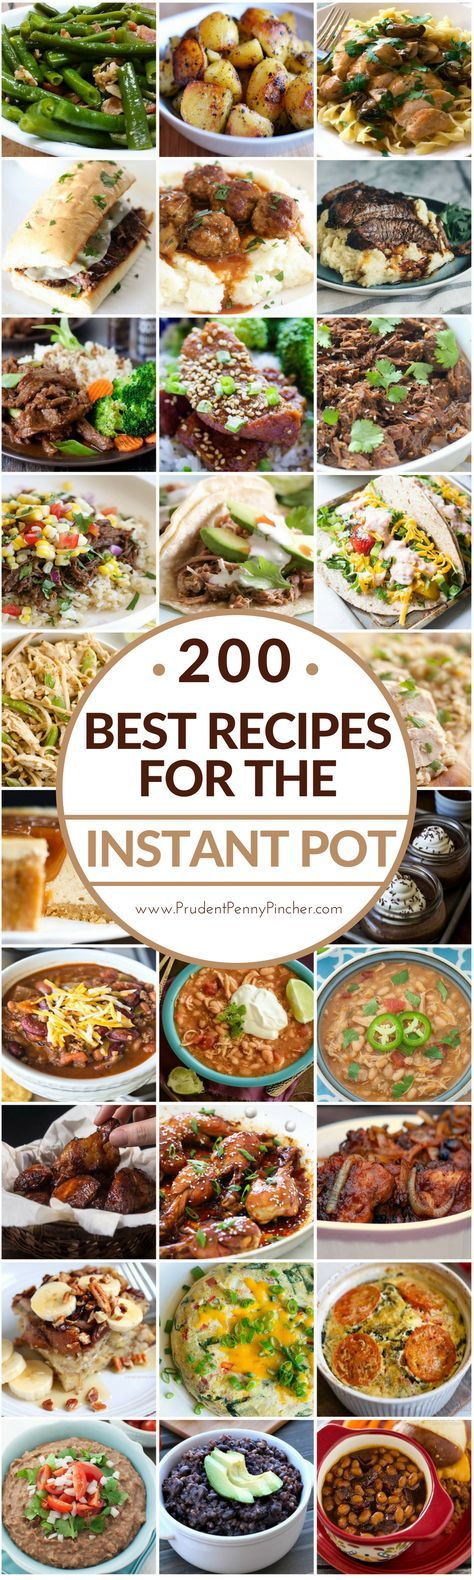 200 Best Instant Pot Recipes - Prudent Penny Pincher